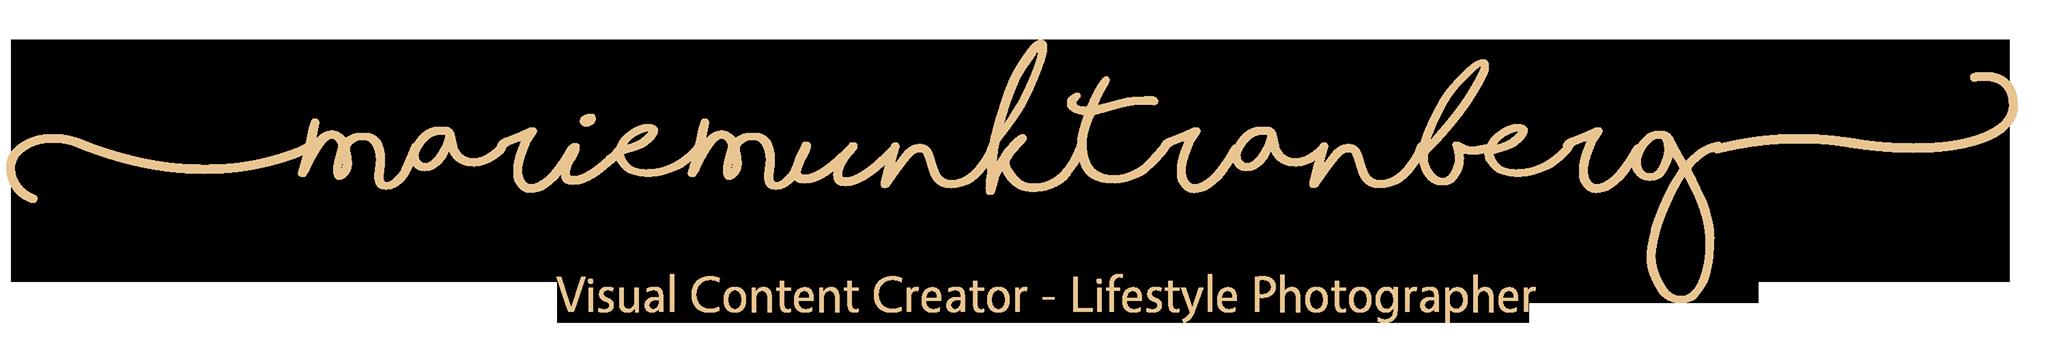 Marie Munk Tranberg Logo